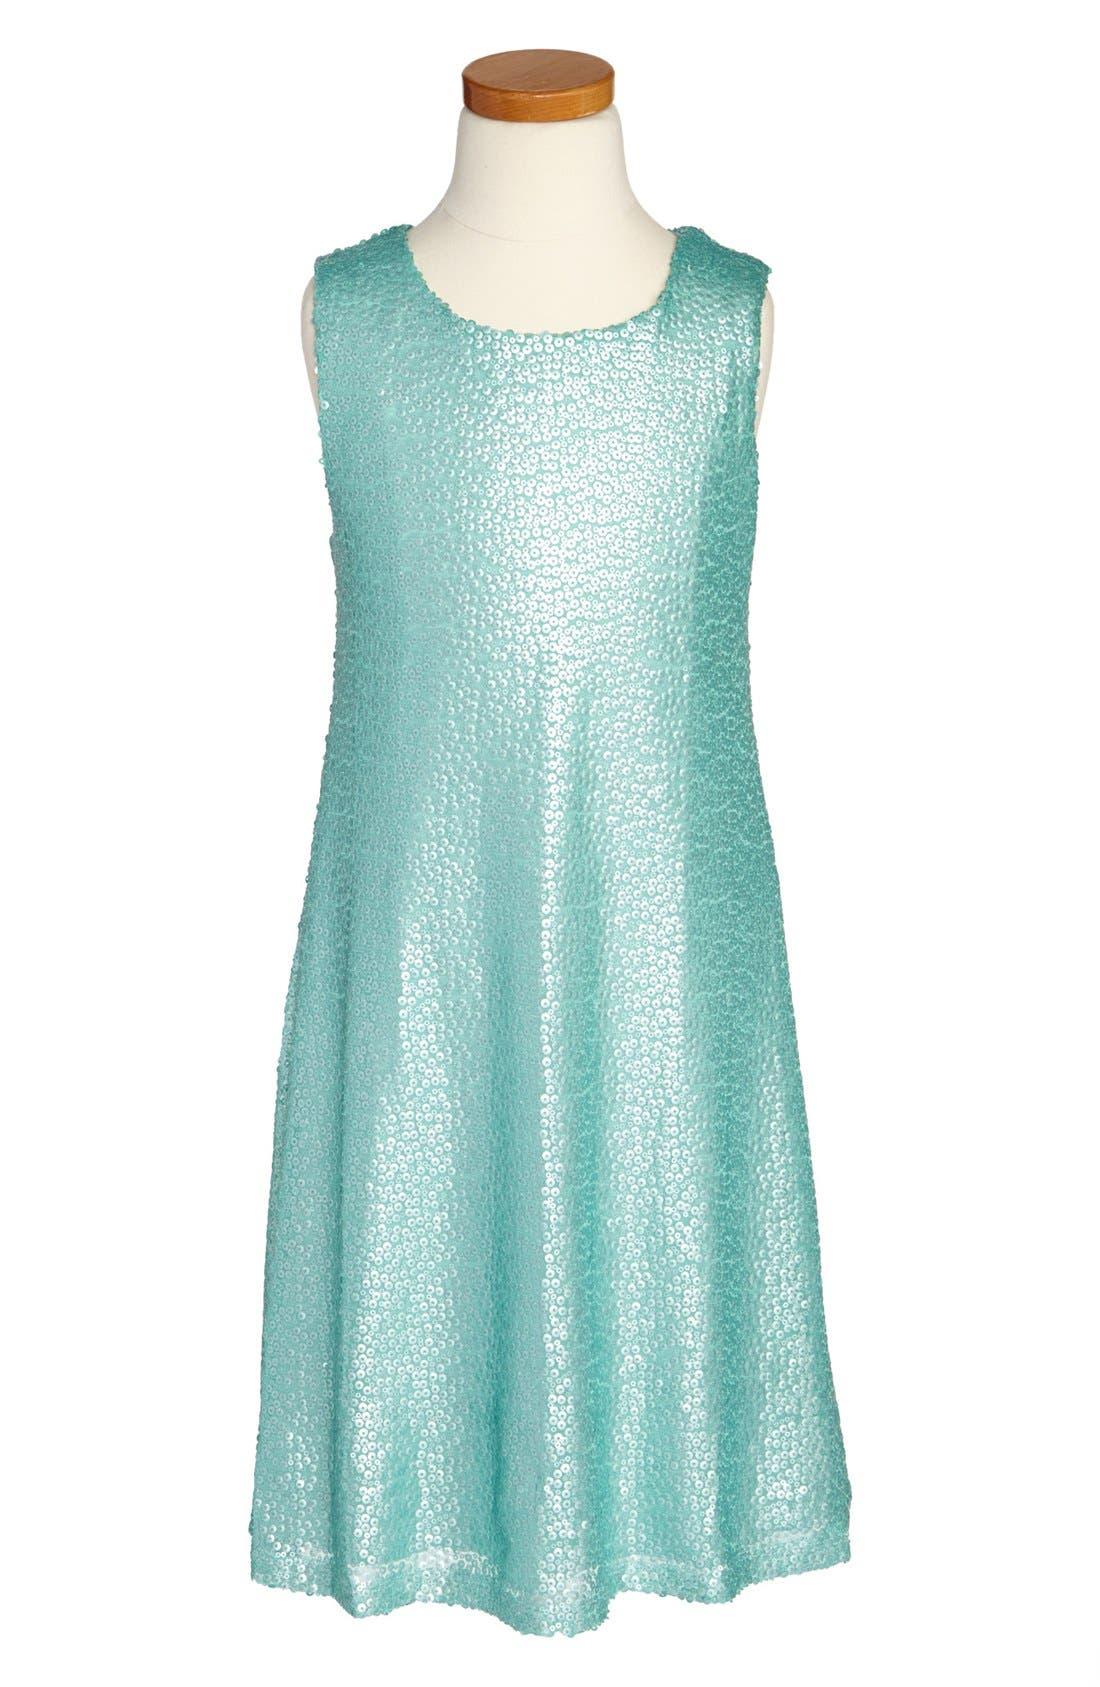 Alternate Image 1 Selected - Zunie Sequin Tank Dress (Big Girls)